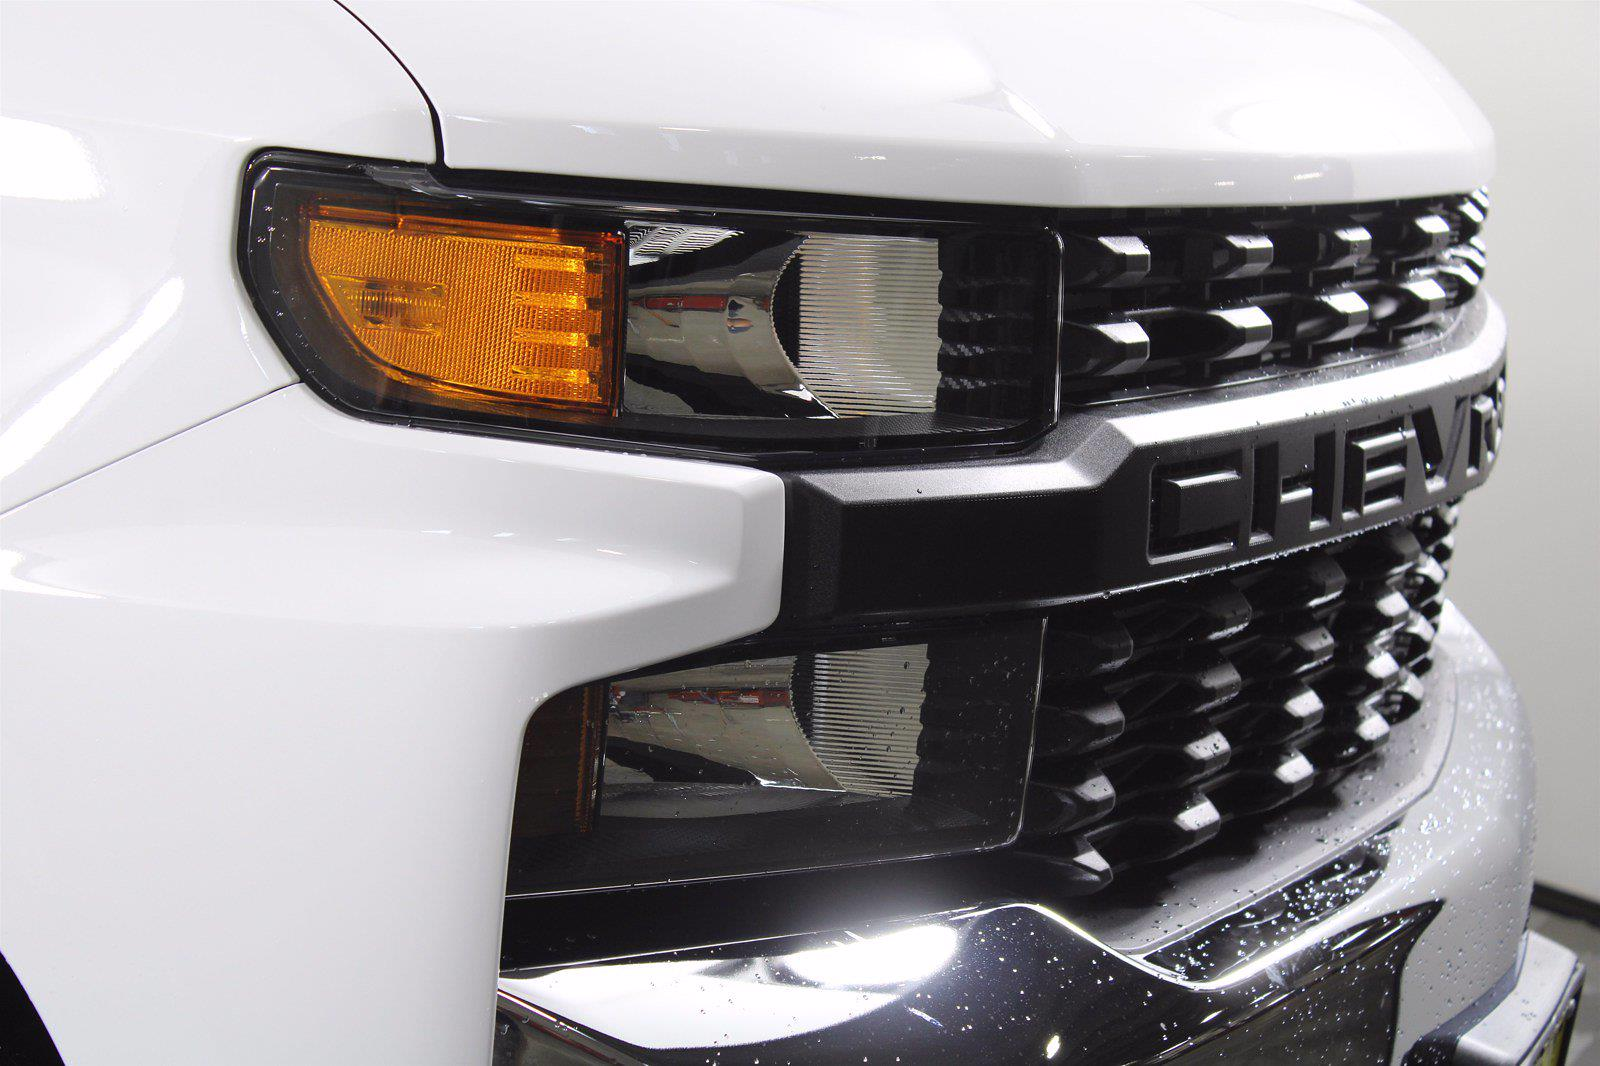 2021 Silverado 1500 Regular Cab 4x2,  Pickup #D111163 - photo 5